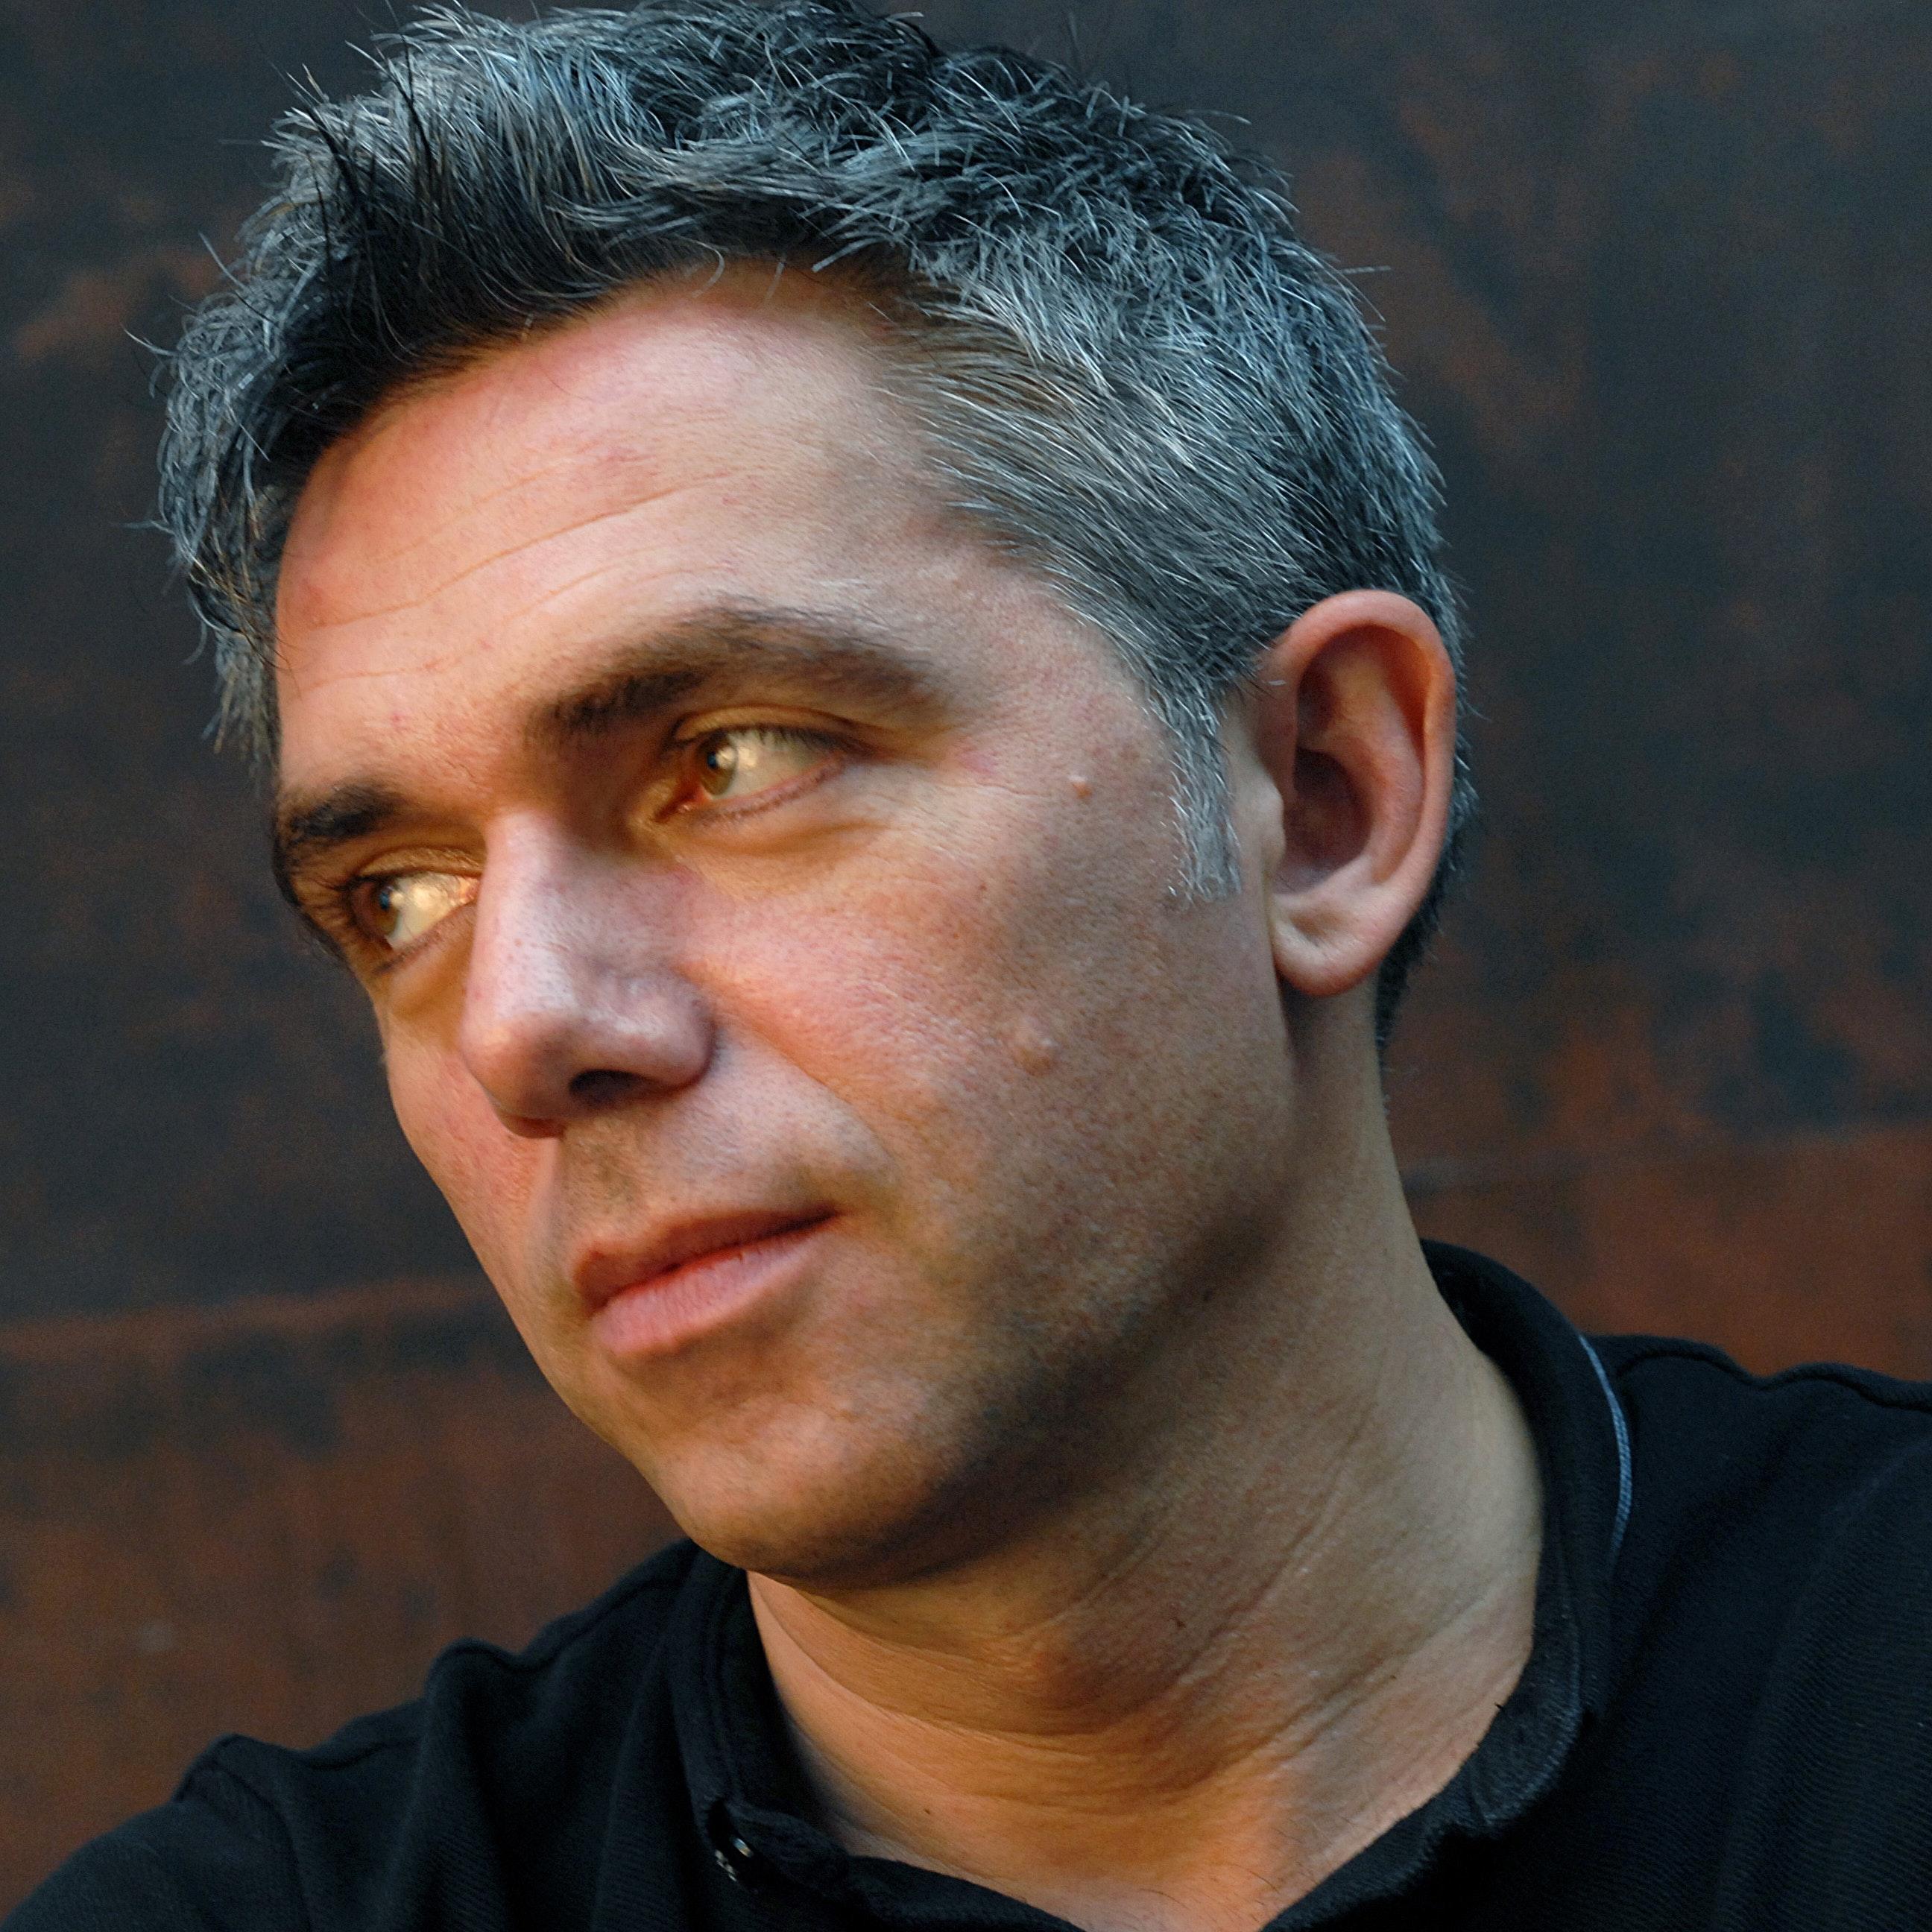 Laurent Pelly